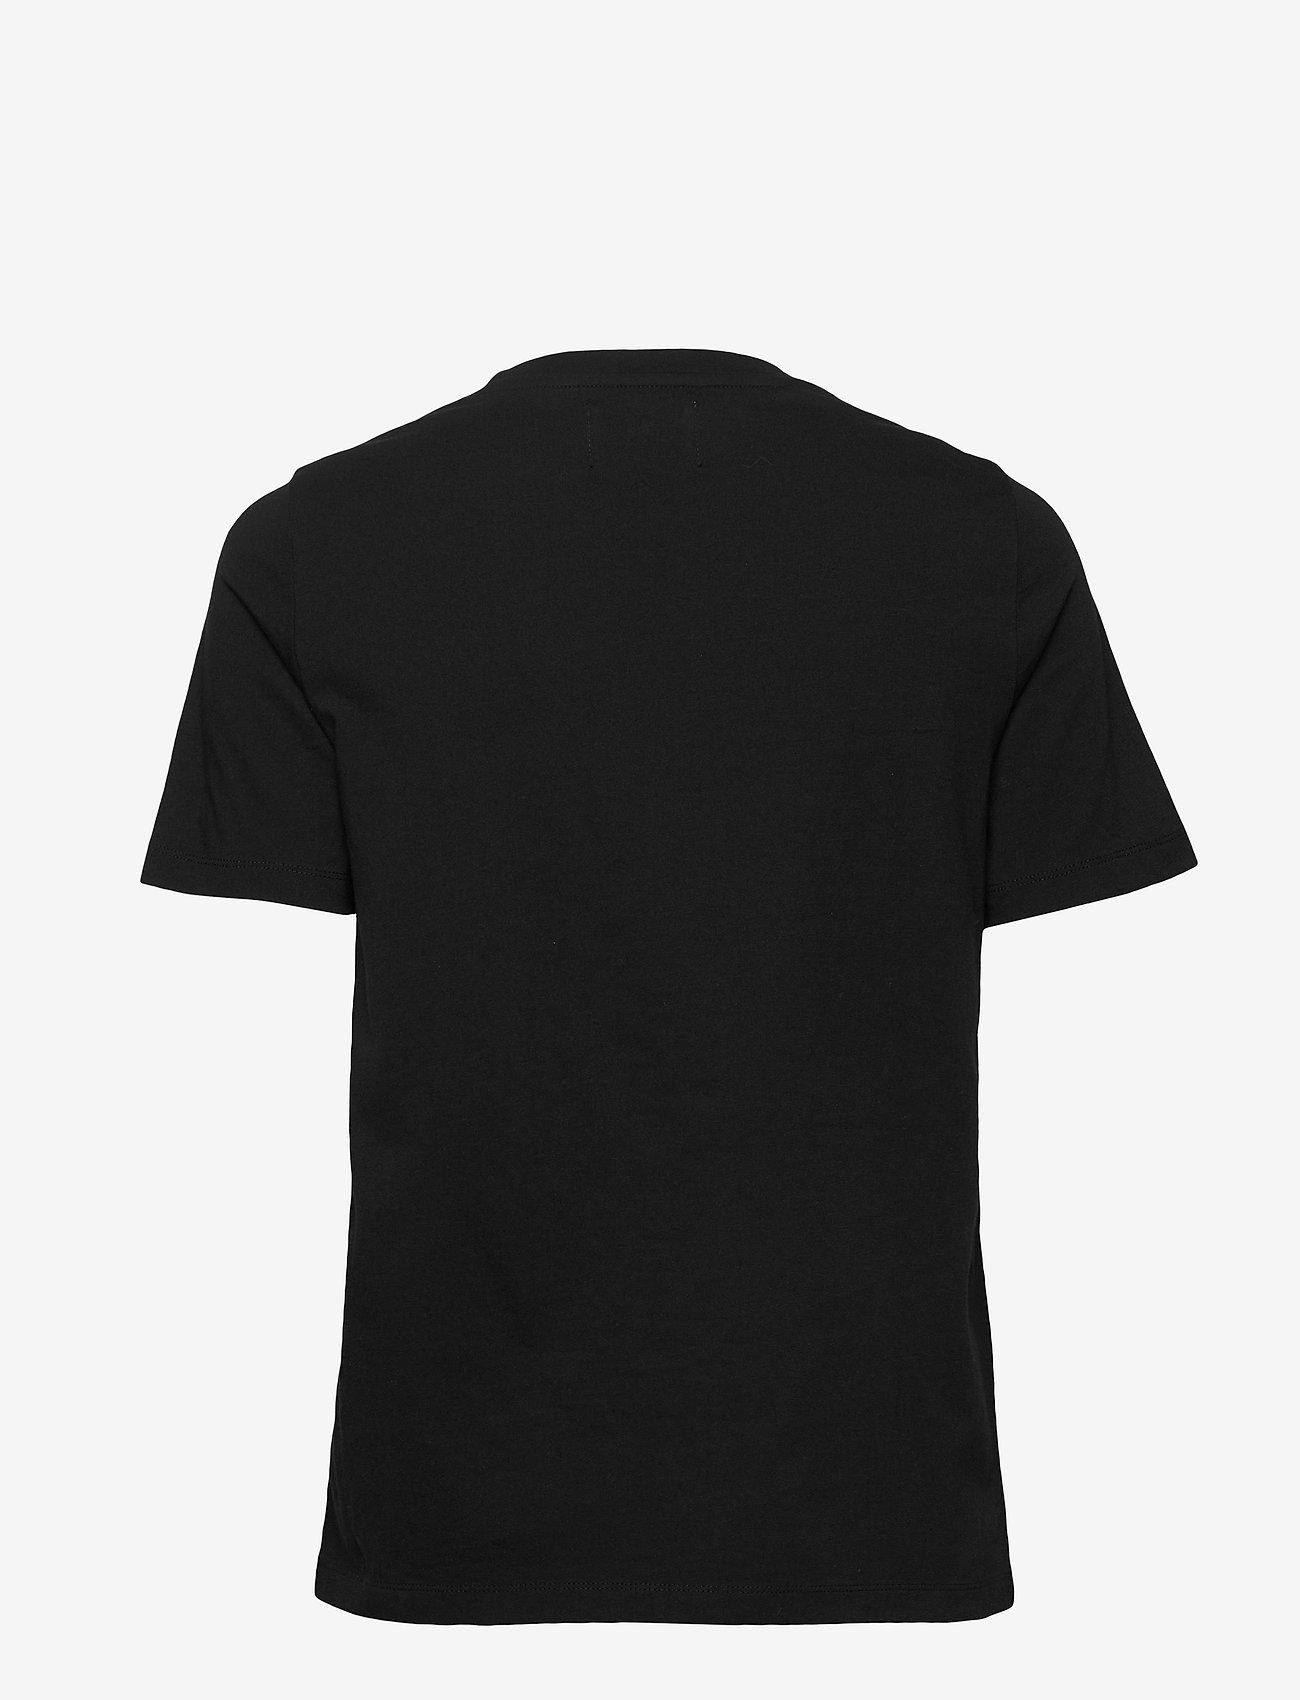 Wood Wood - Mia T-shirt - t-shirts - black - 1